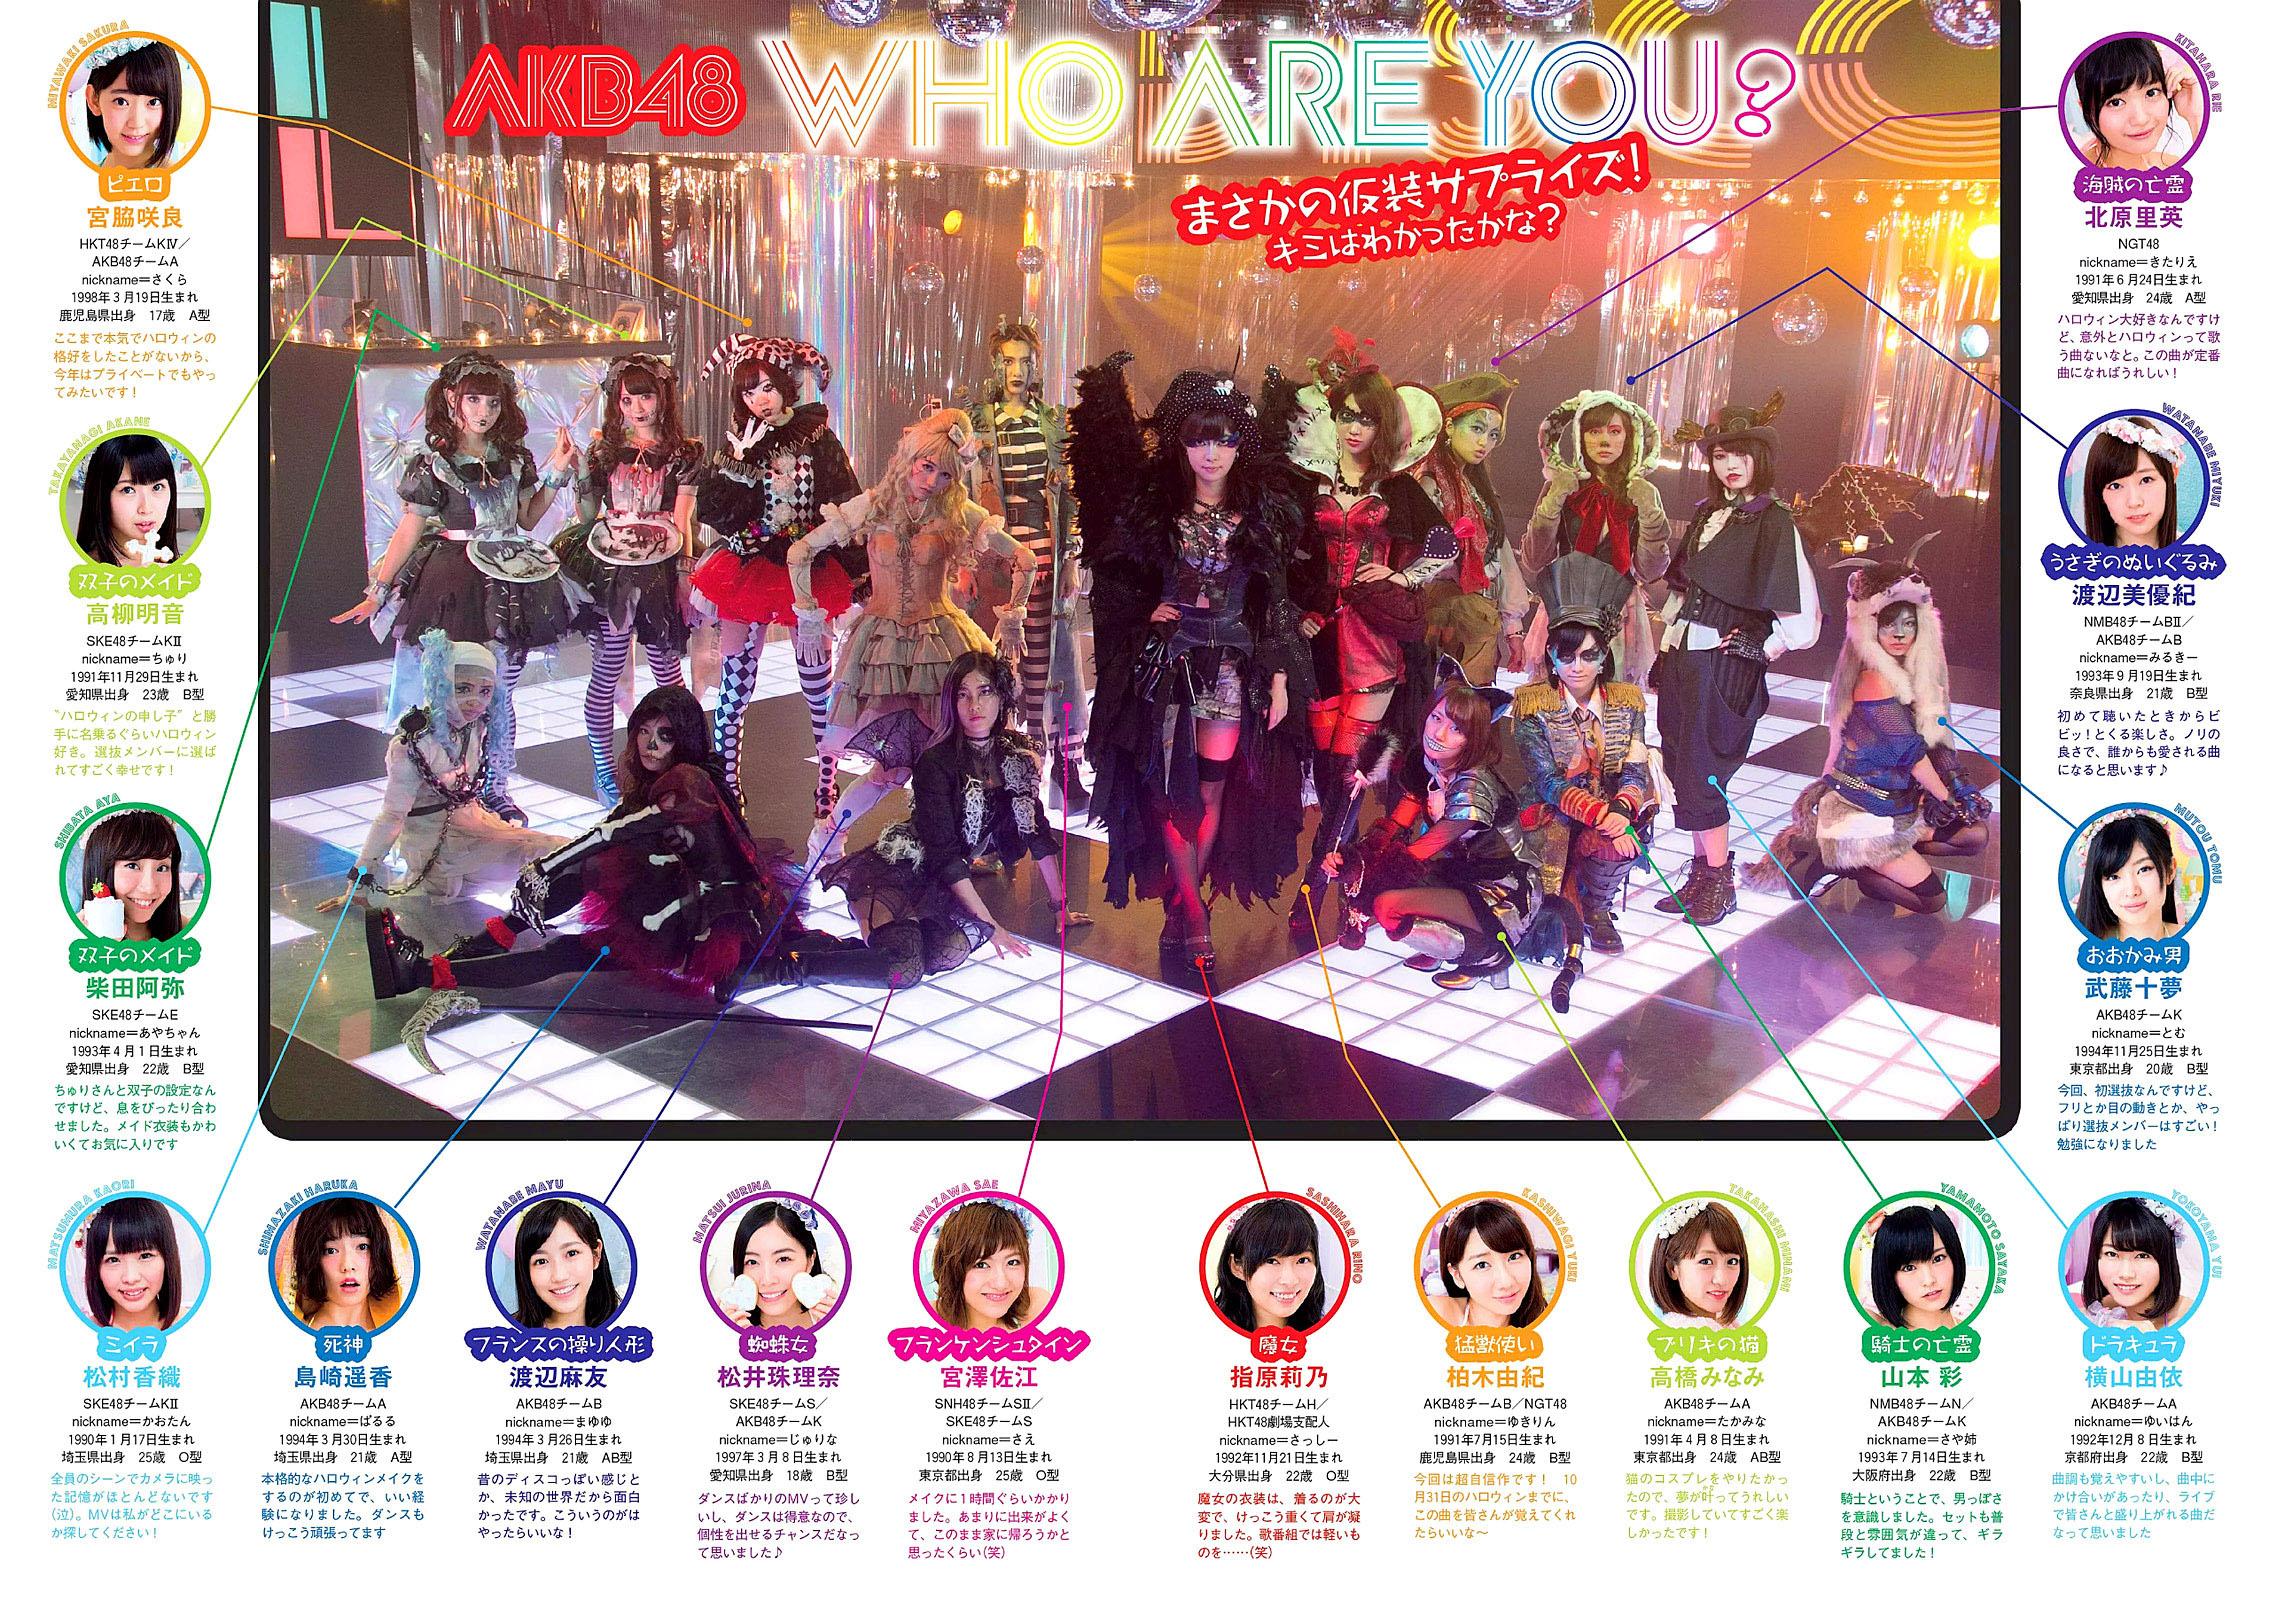 AKB48 WPB 150907 02.jpg